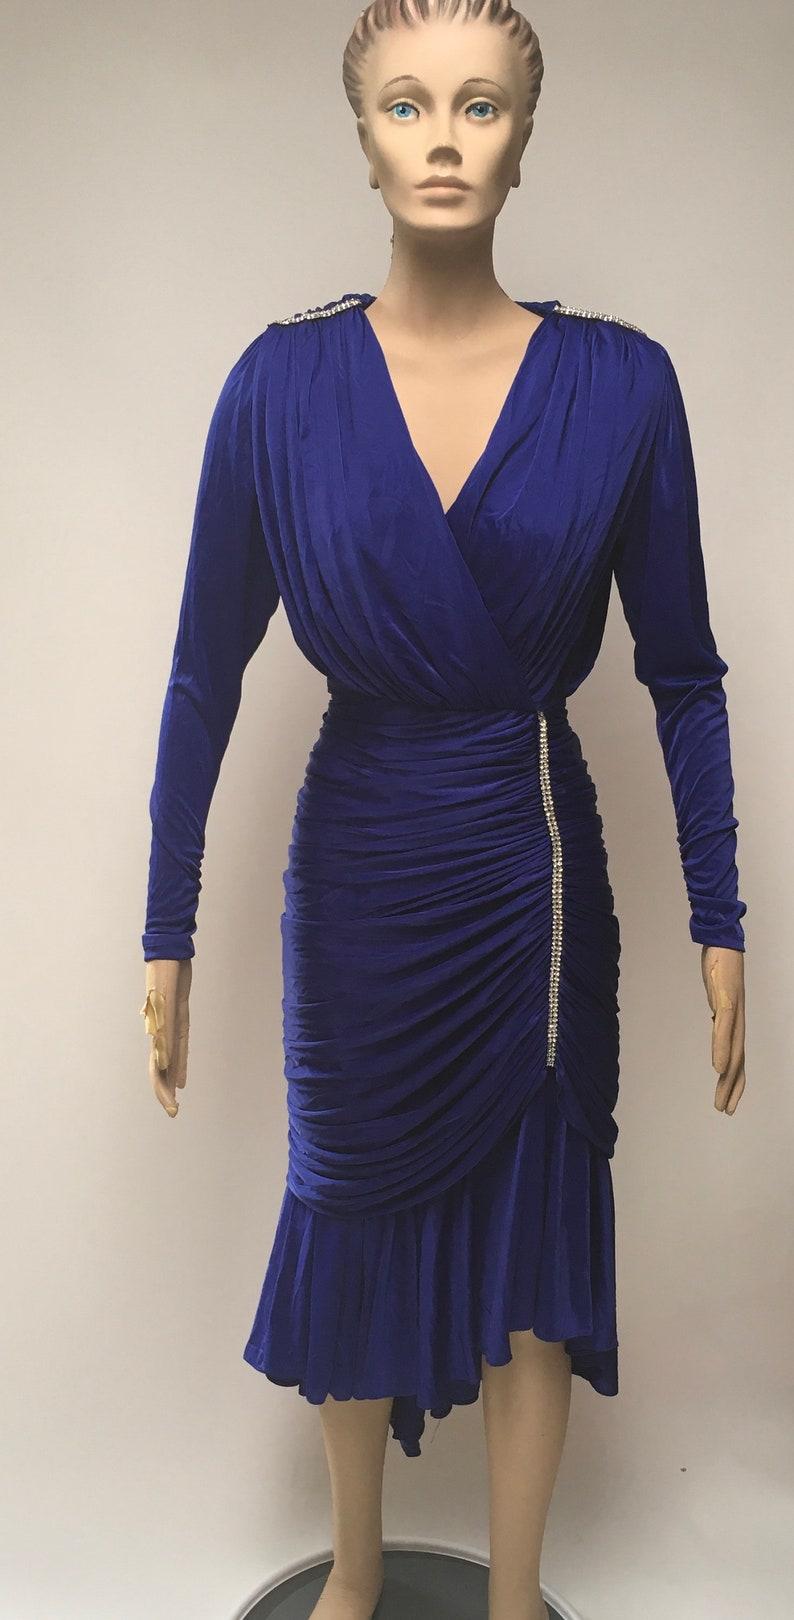 b3f97d988d3 80s Ruched Dress Blue Stretch Rhinestone Evening Frock